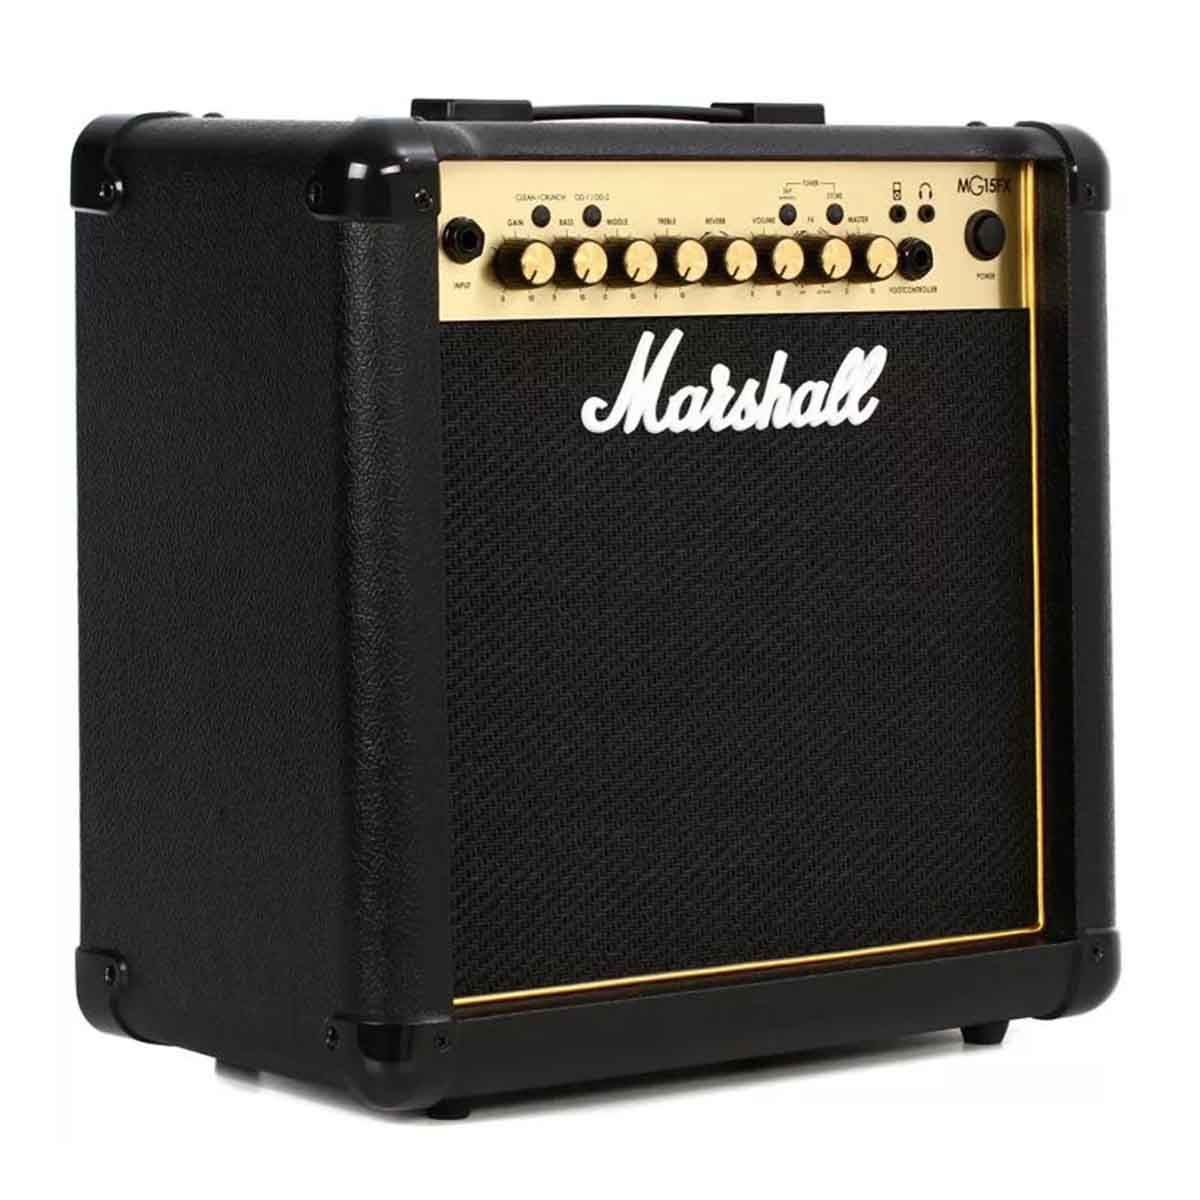 Caixa Amplificada Marshall MG15FX Gold 15W 110V Para Guitarra